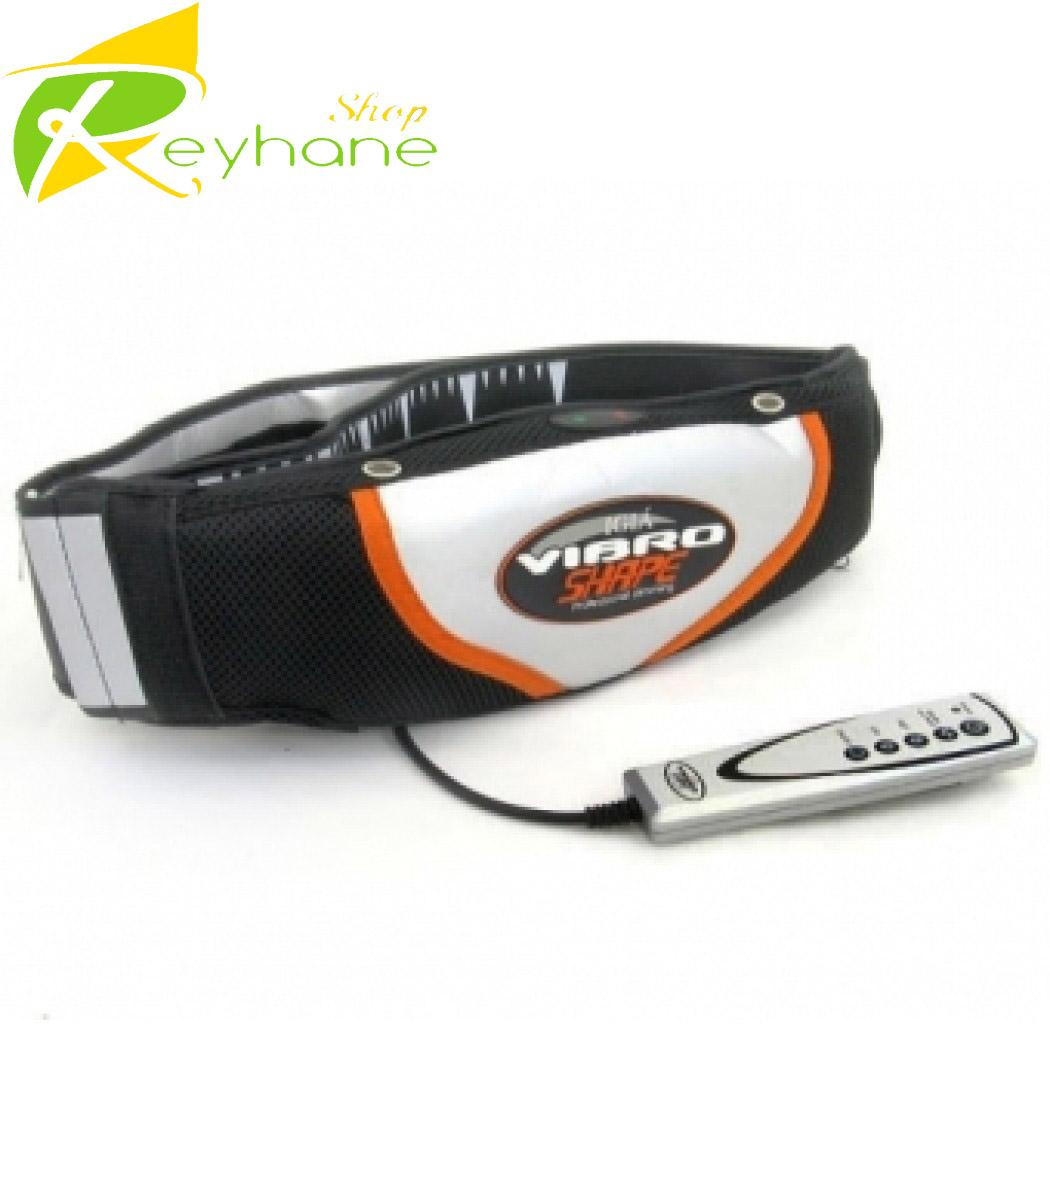 کمربند لاغری ویبرو شیپ Vibro Shape